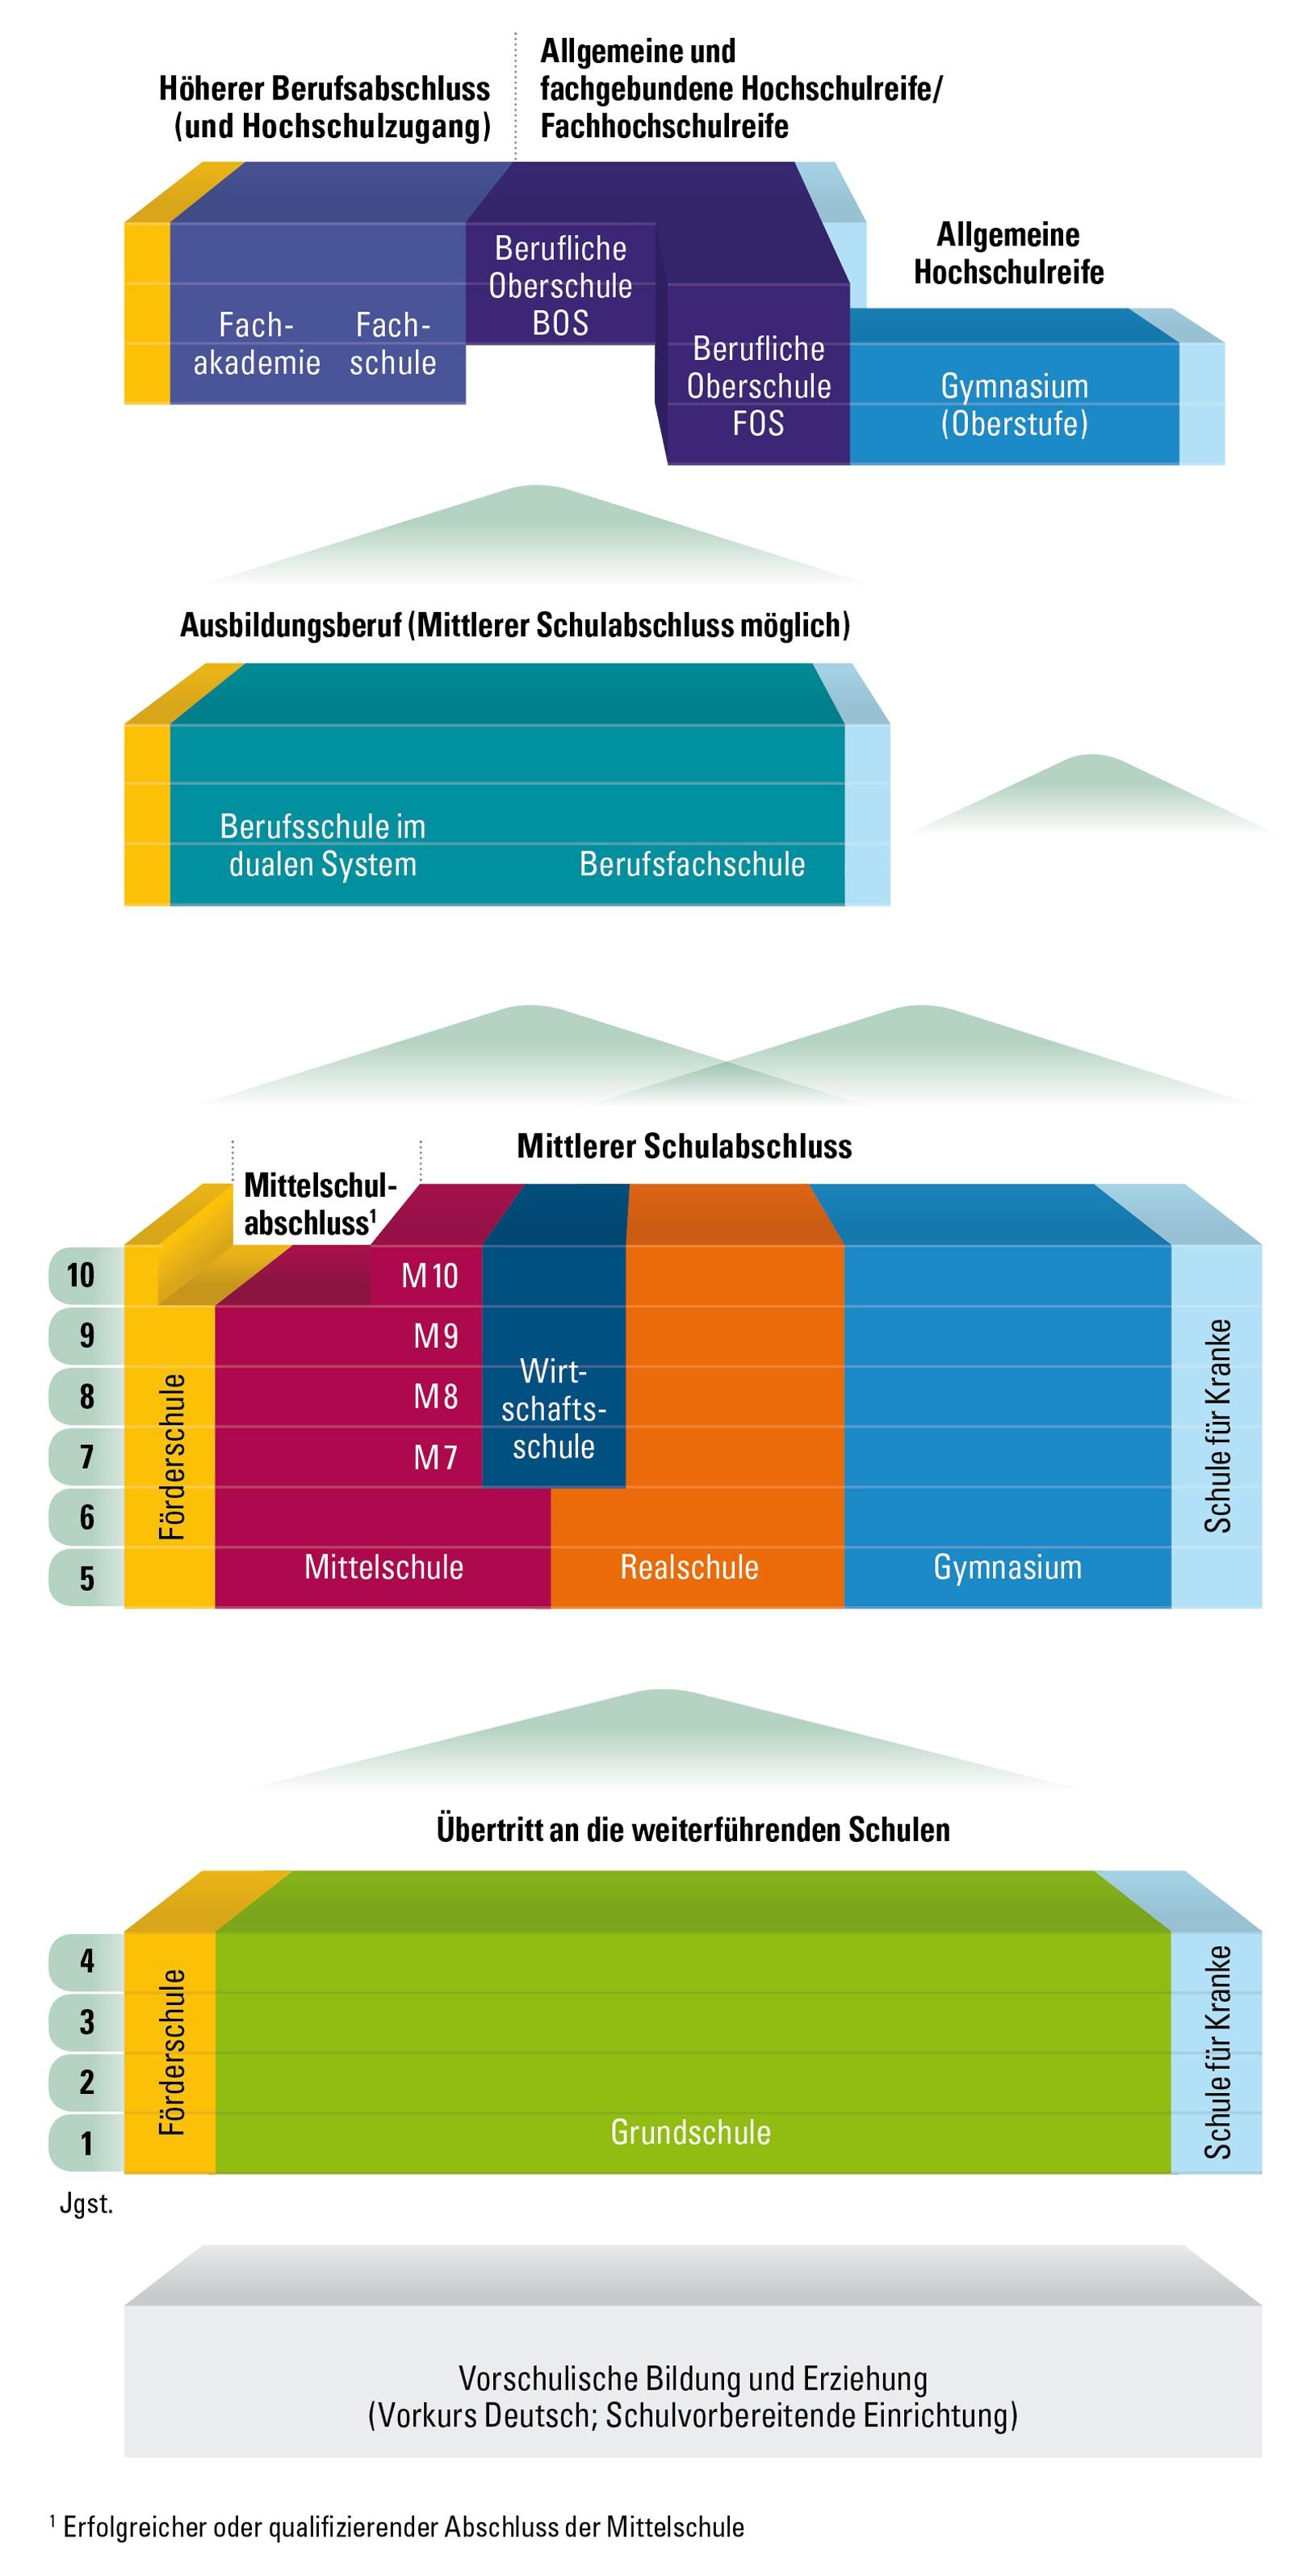 Schullaufbahn leonhard frank schule for Schule grafik